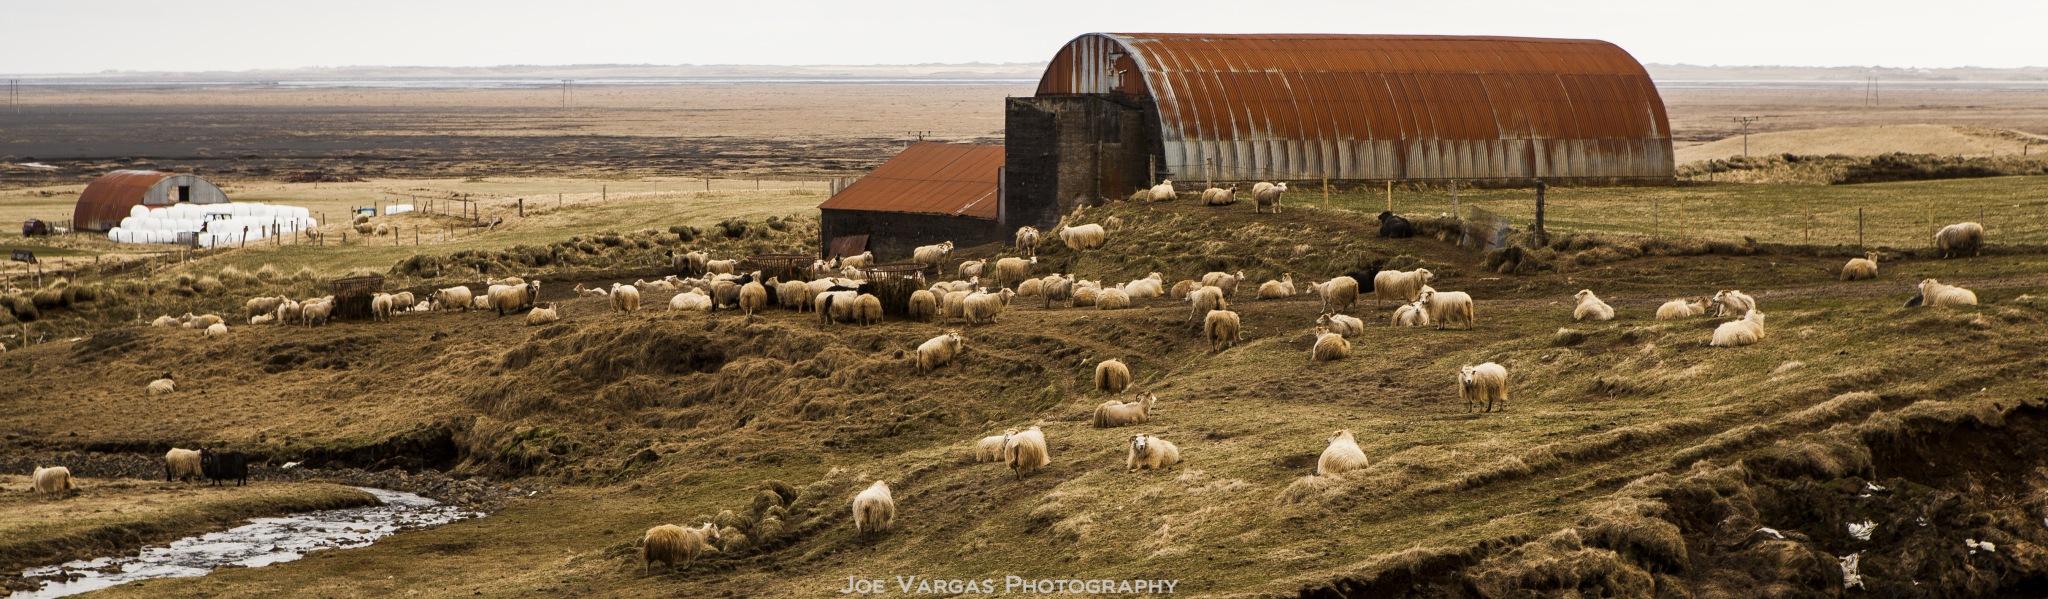 Iceland_2016-04-24-238L